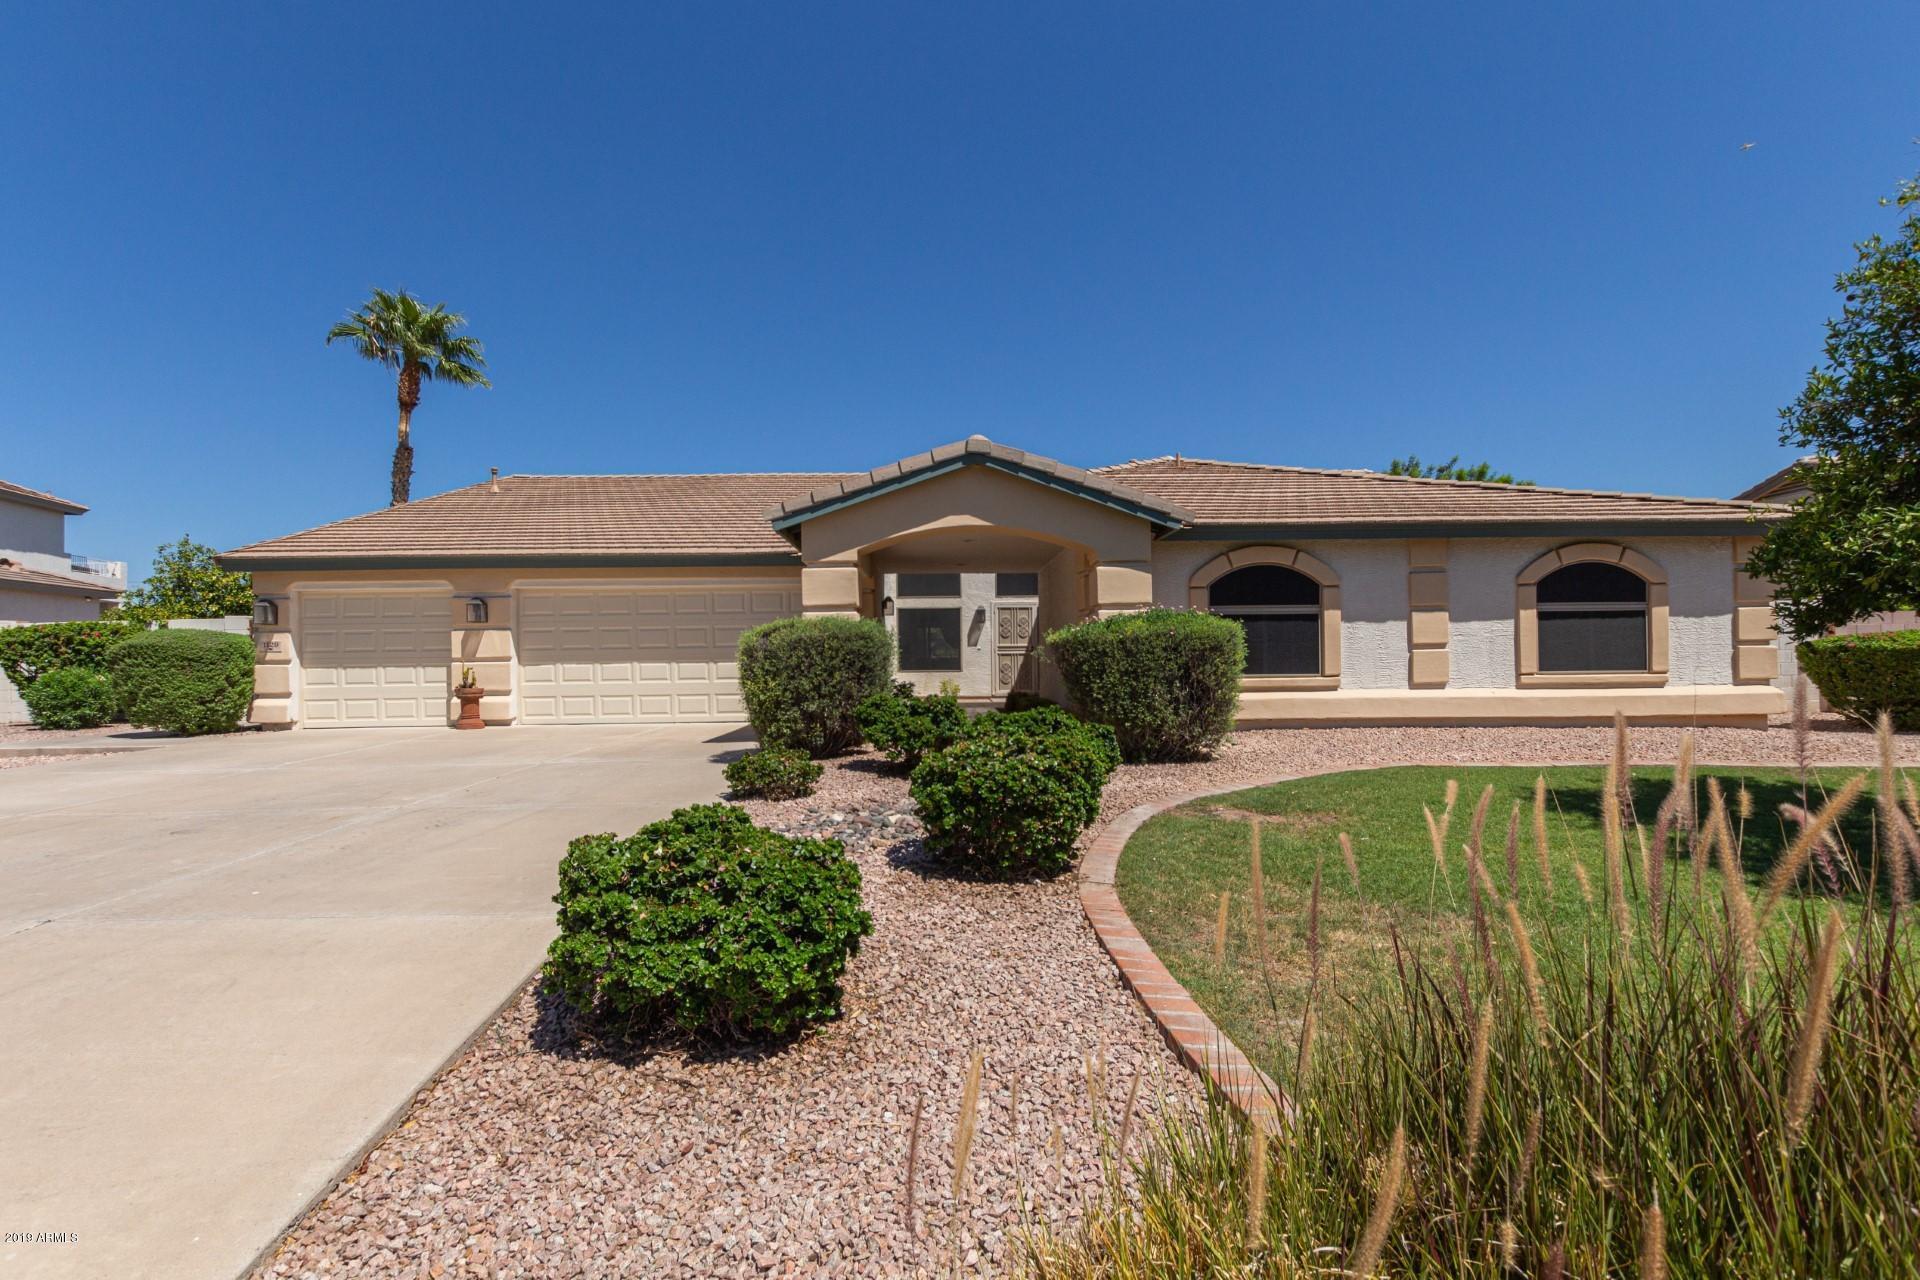 Photo of 1129 N OMAHA --, Mesa, AZ 85205